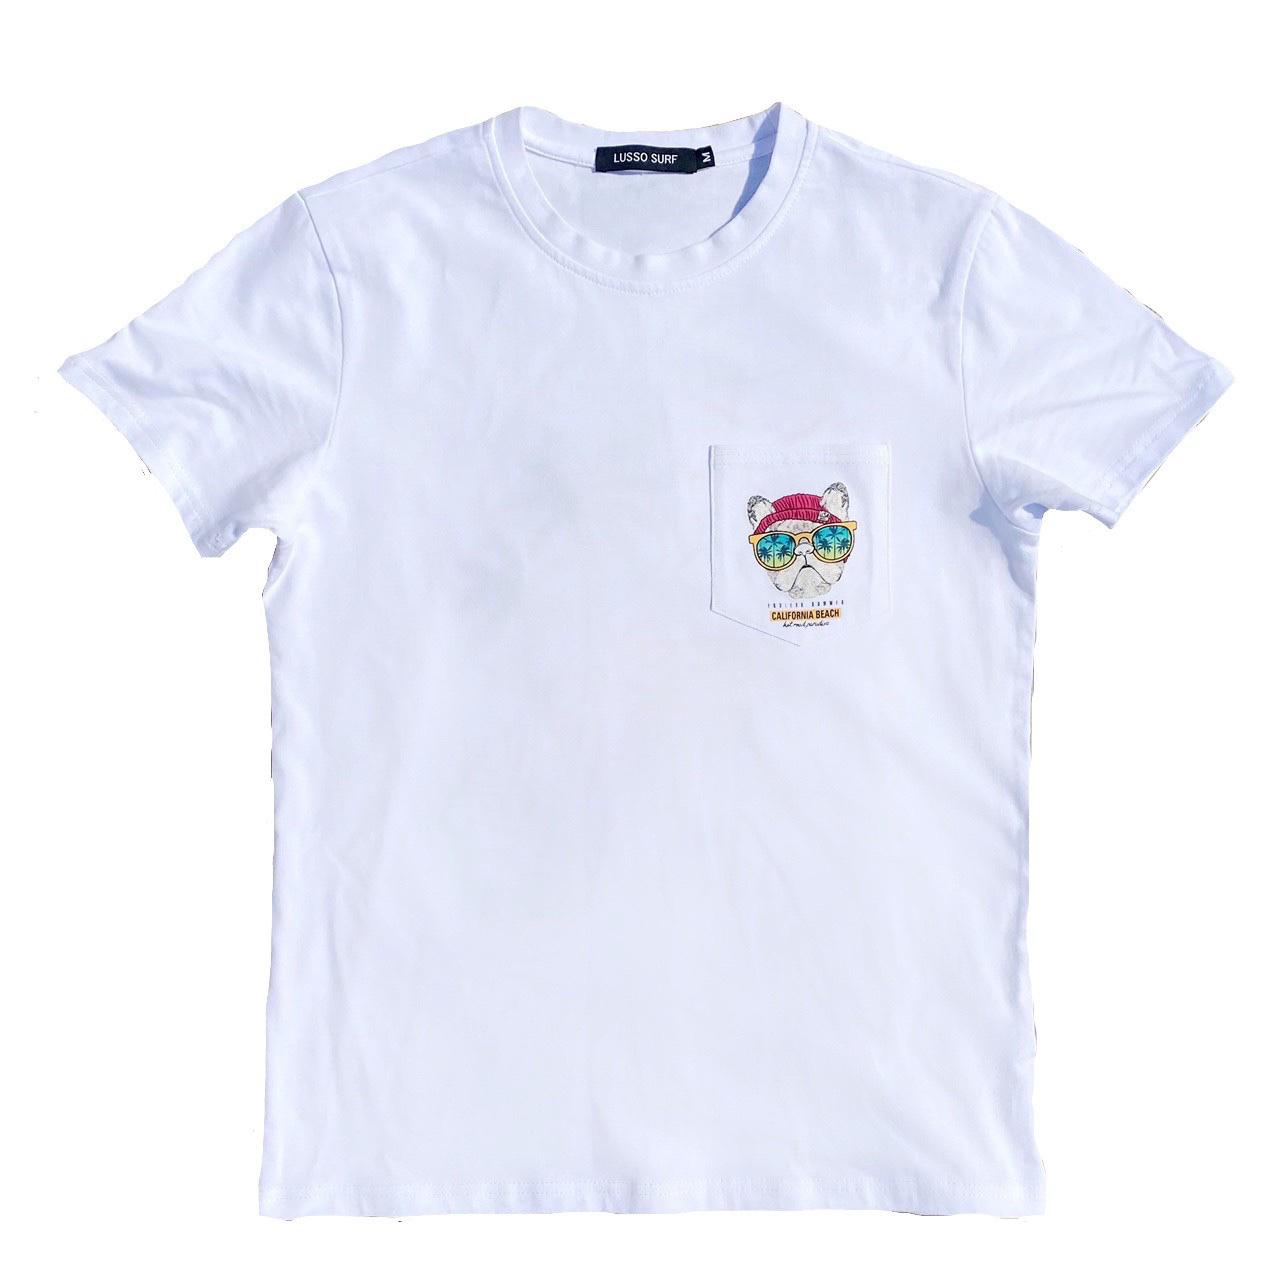 California embroidery pocket Tee